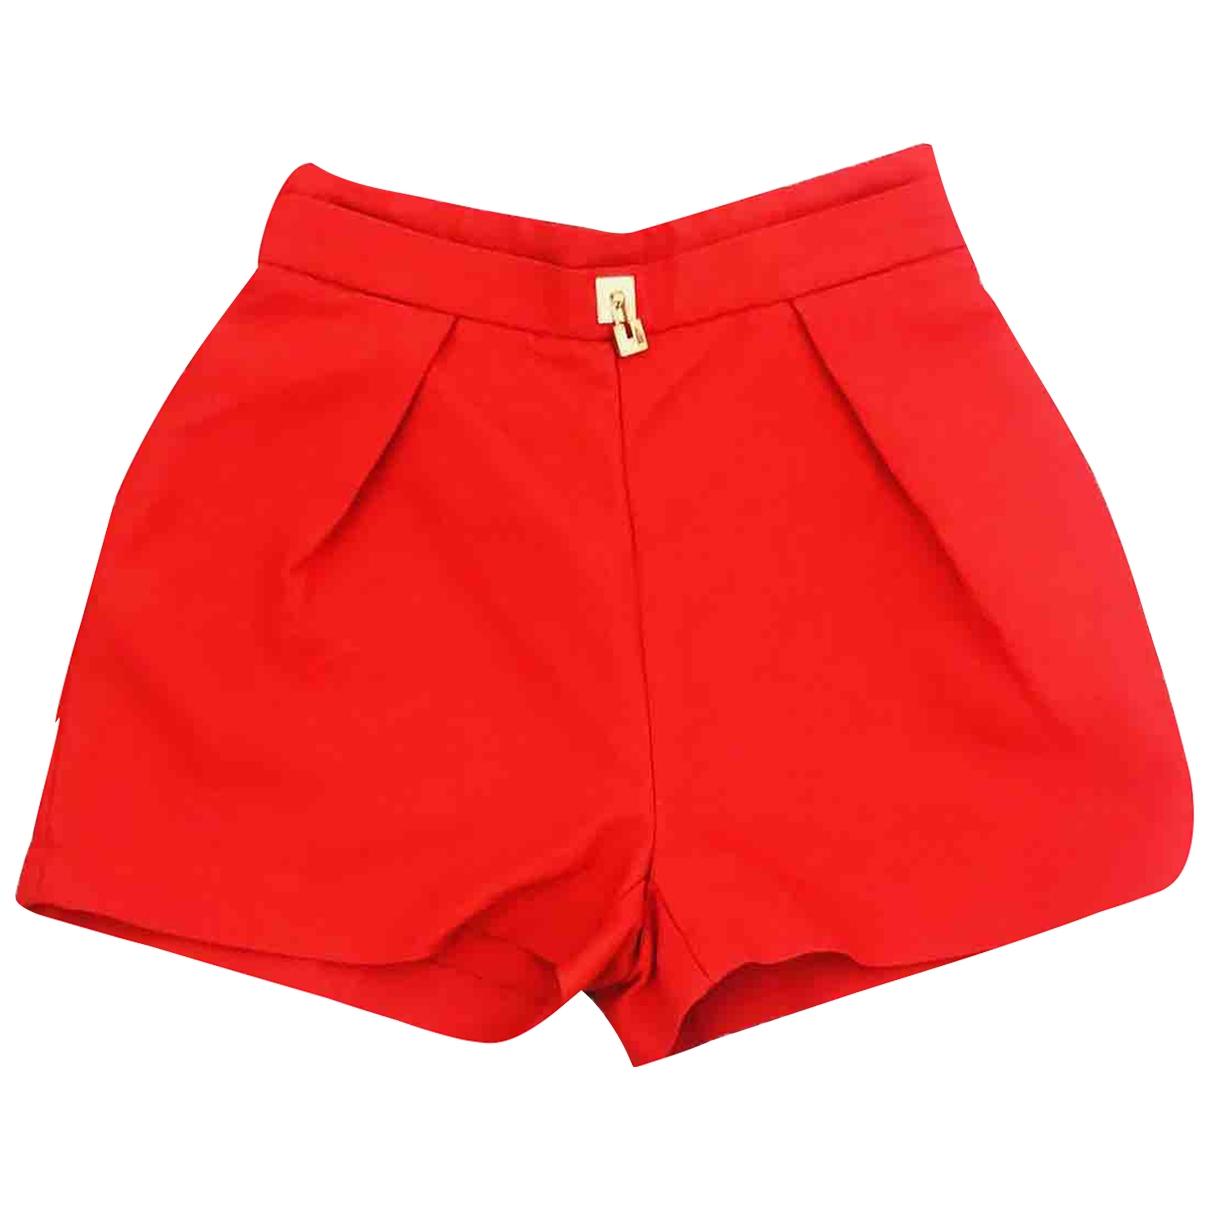 Elisabetta Franchi \N Red Shorts for Women 42 IT